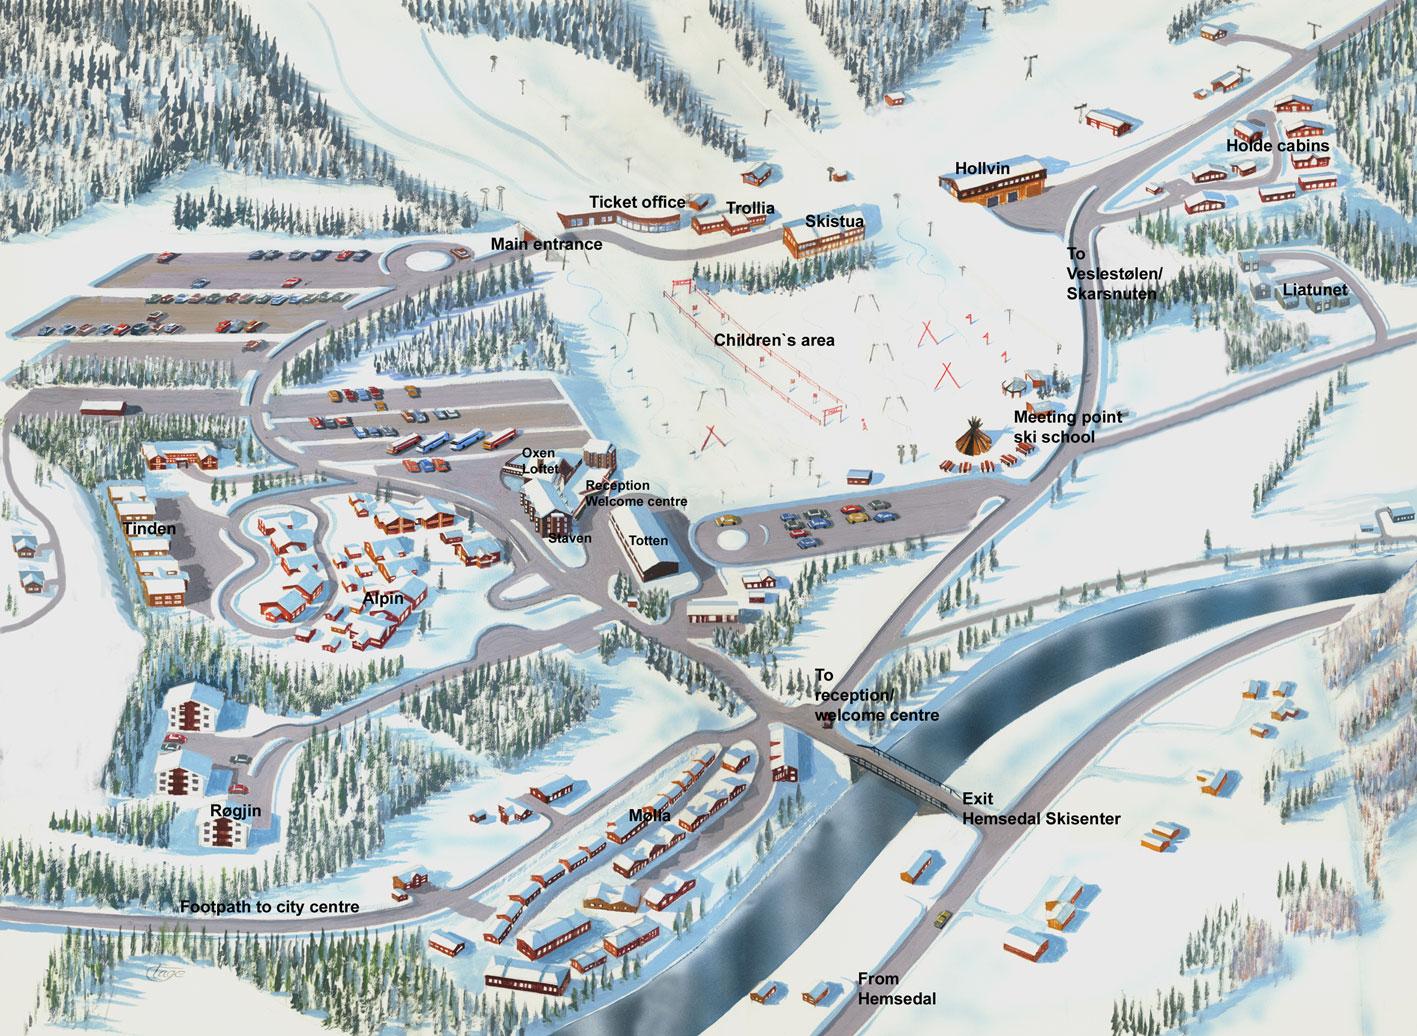 Maps Of Hemsedal Ski Resort In Norway Sno